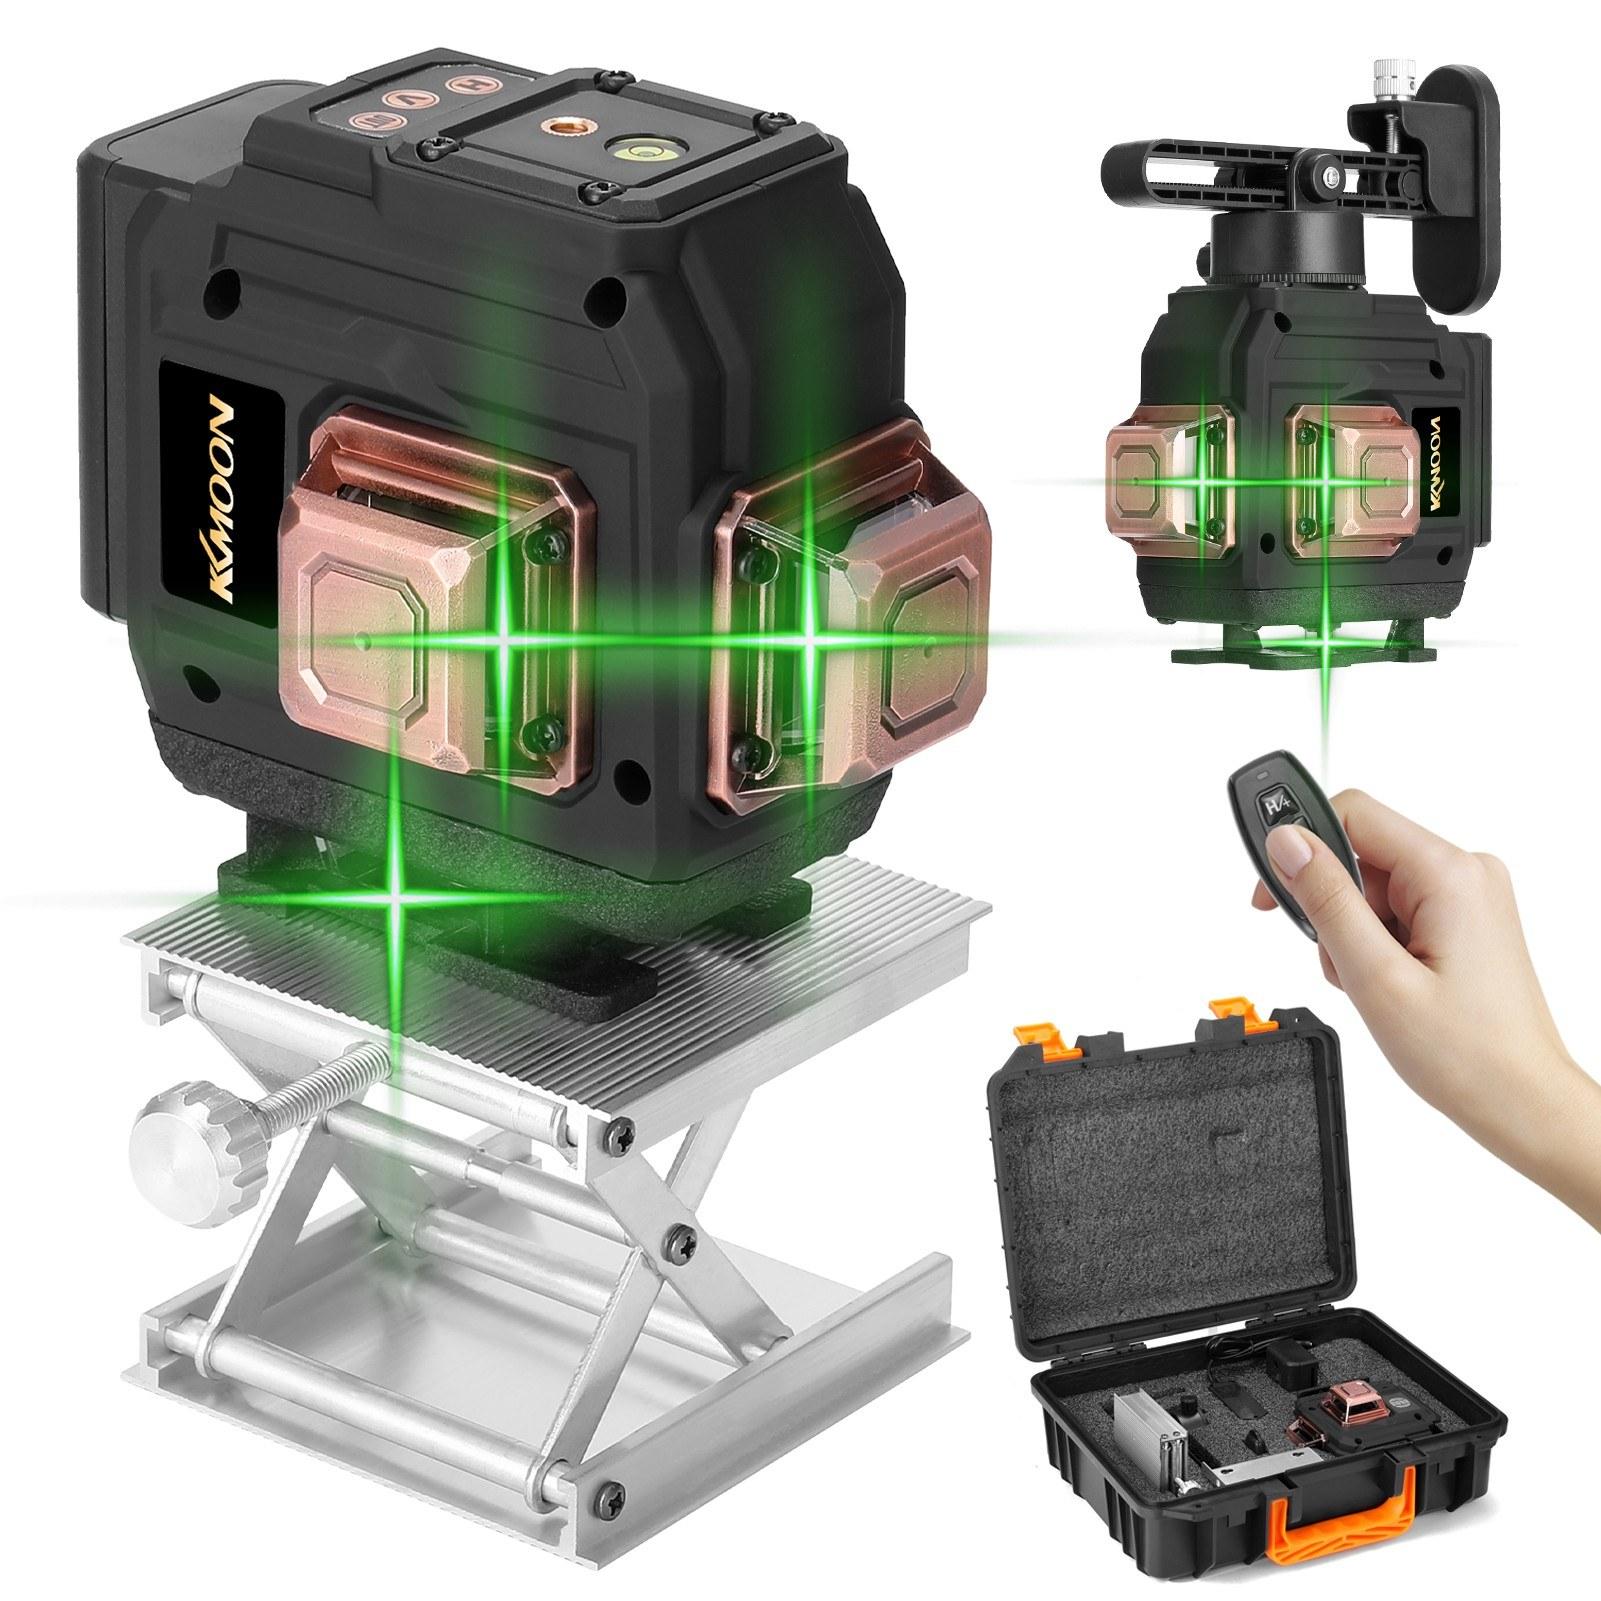 TomTop - [EU Warehouse] 56% OFF KKmoon Multifunctional 3D 12 Lines Laser Level Tool, $52.99 (Inclusive of VAT)